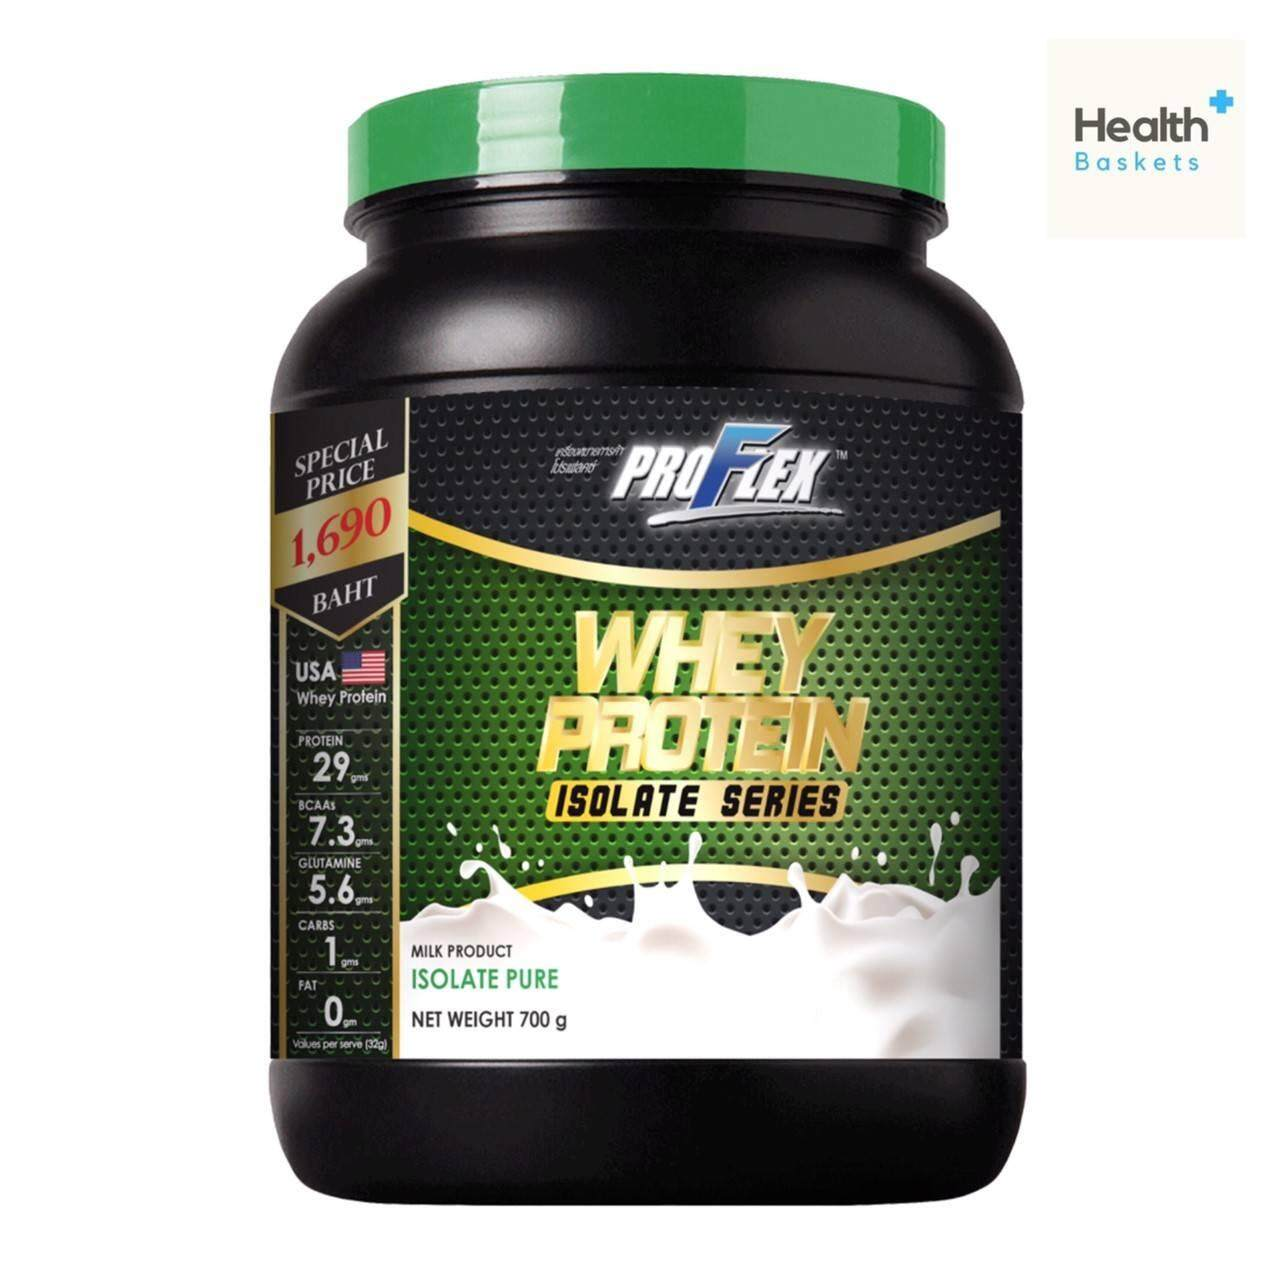 Proflex Whey Protein Isolate PURE 1 กระป๋อง โปรเฟล็กซ์ เวย์โปรตีน รสจืด สูตรไอโซเลท 700 g